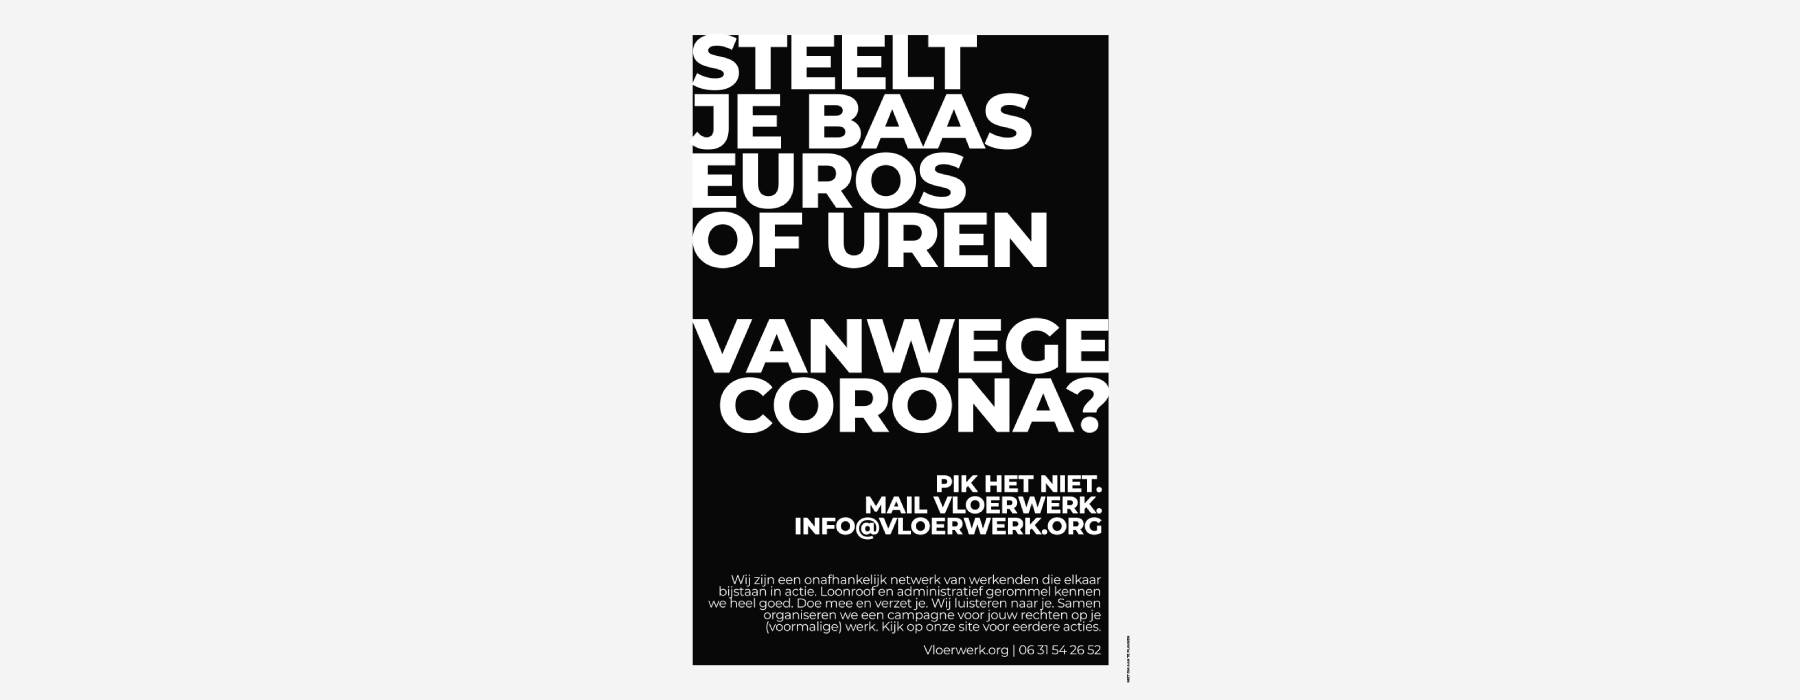 Vloerwerk poster tegen loonroof en urendiefstal vanwege Corona